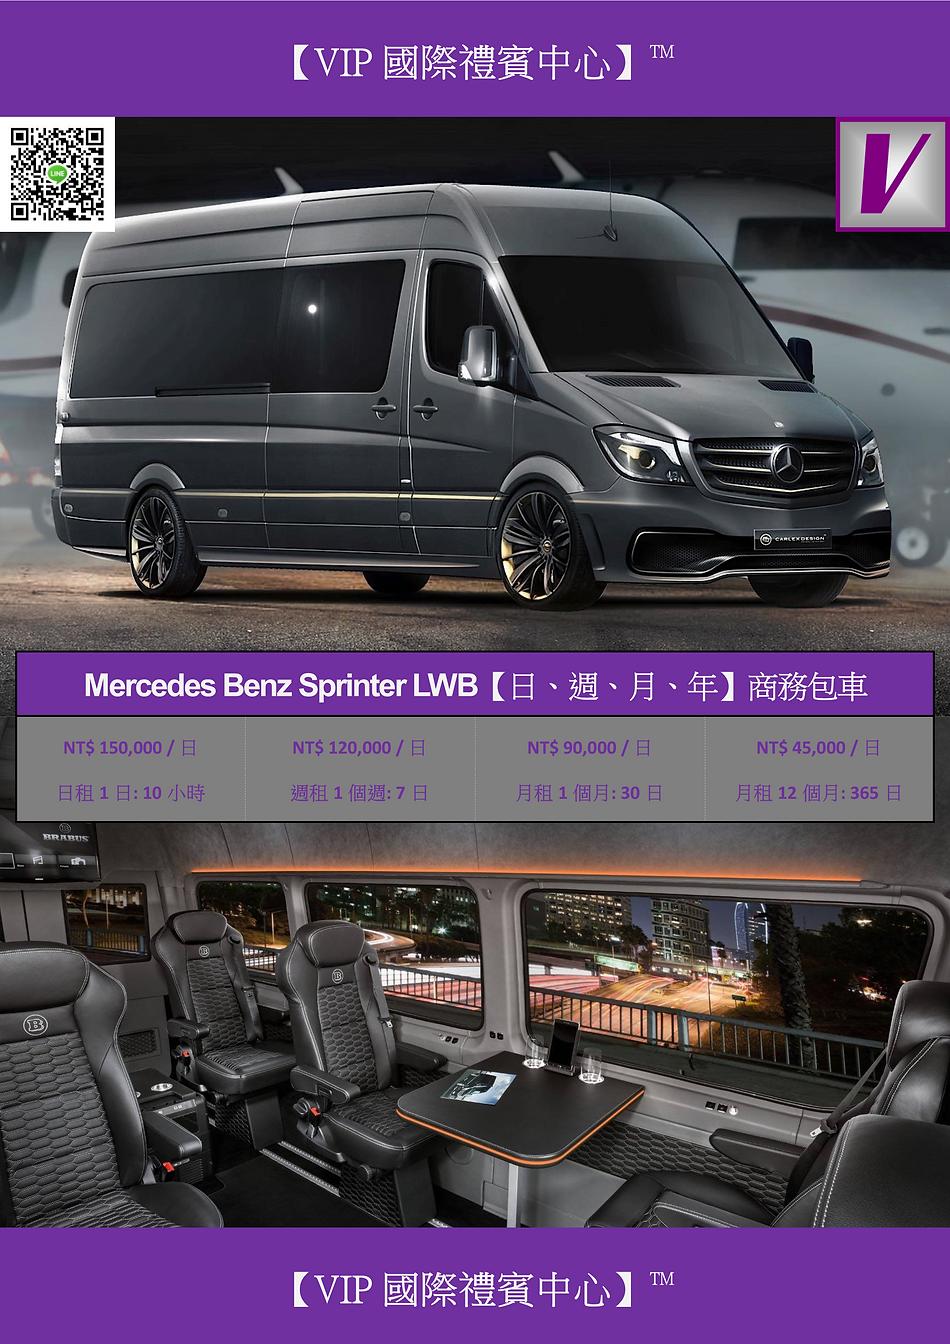 VIP國際禮賓中心 MERCEDES BENZ SPRINTER LWB 臺北市區接送包車